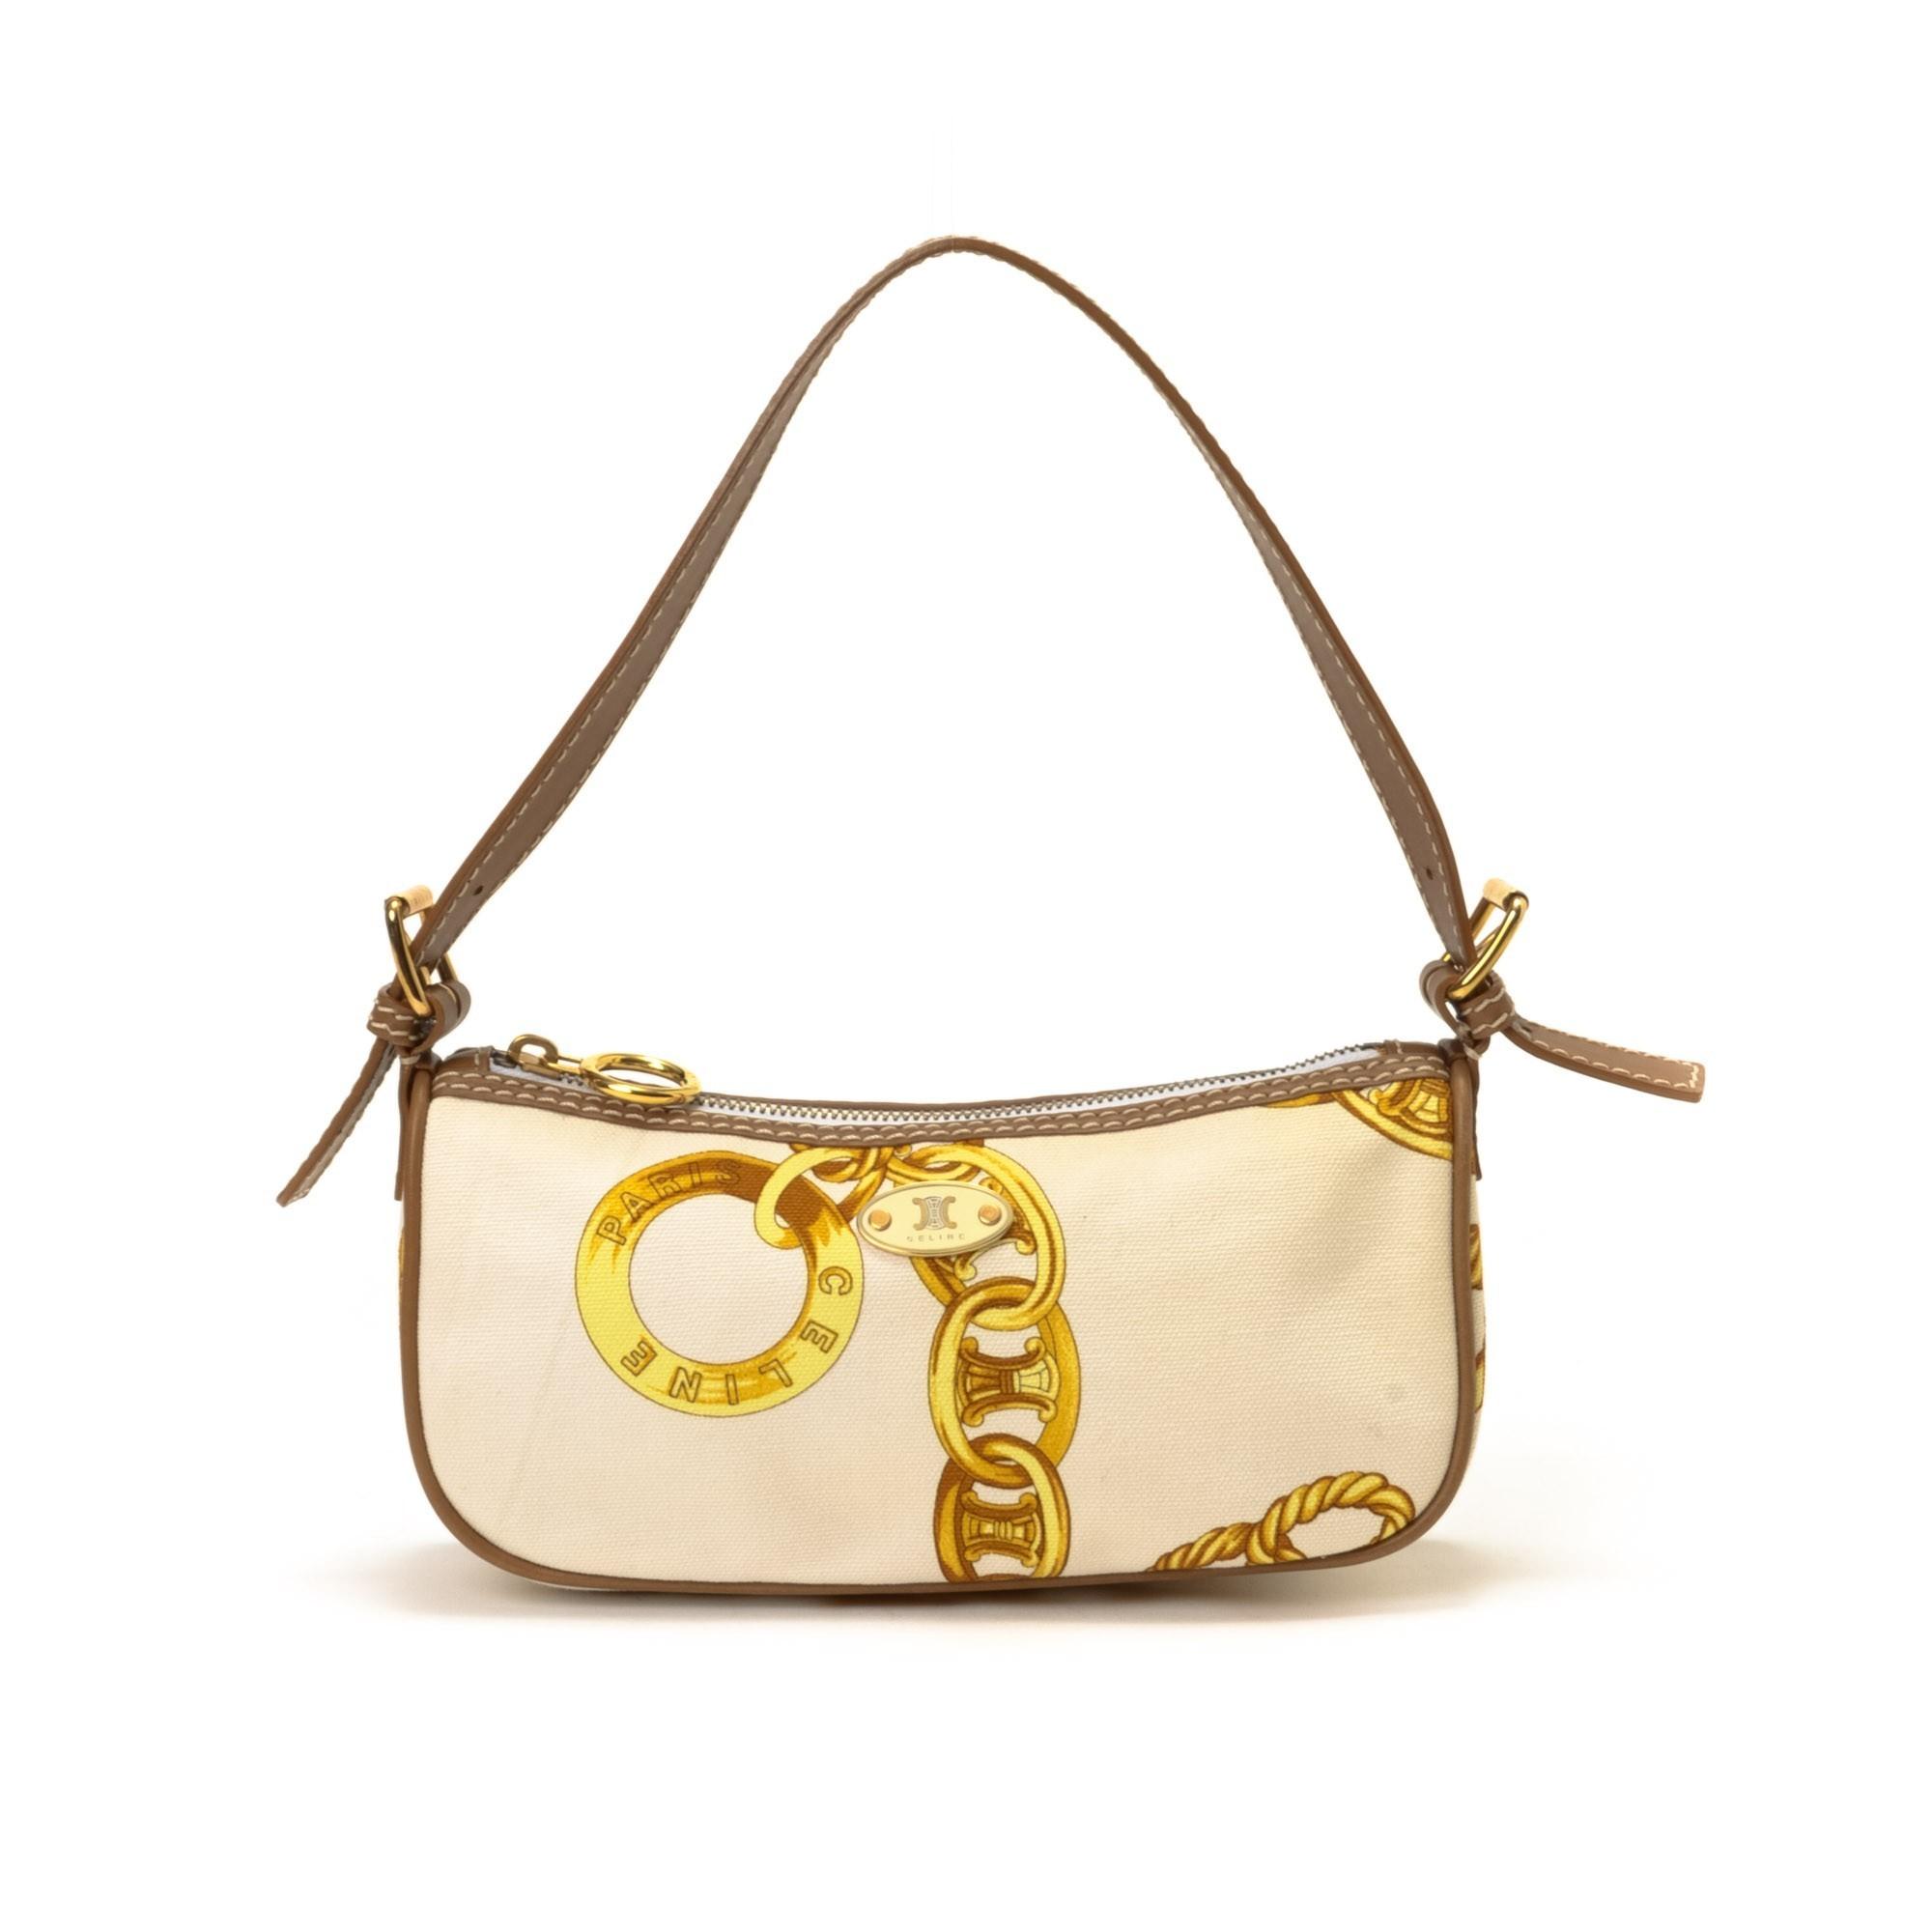 C¨¦LINE Handbag Cream Canvas Handbag - LXR\u0026amp;CO Vintage Luxury